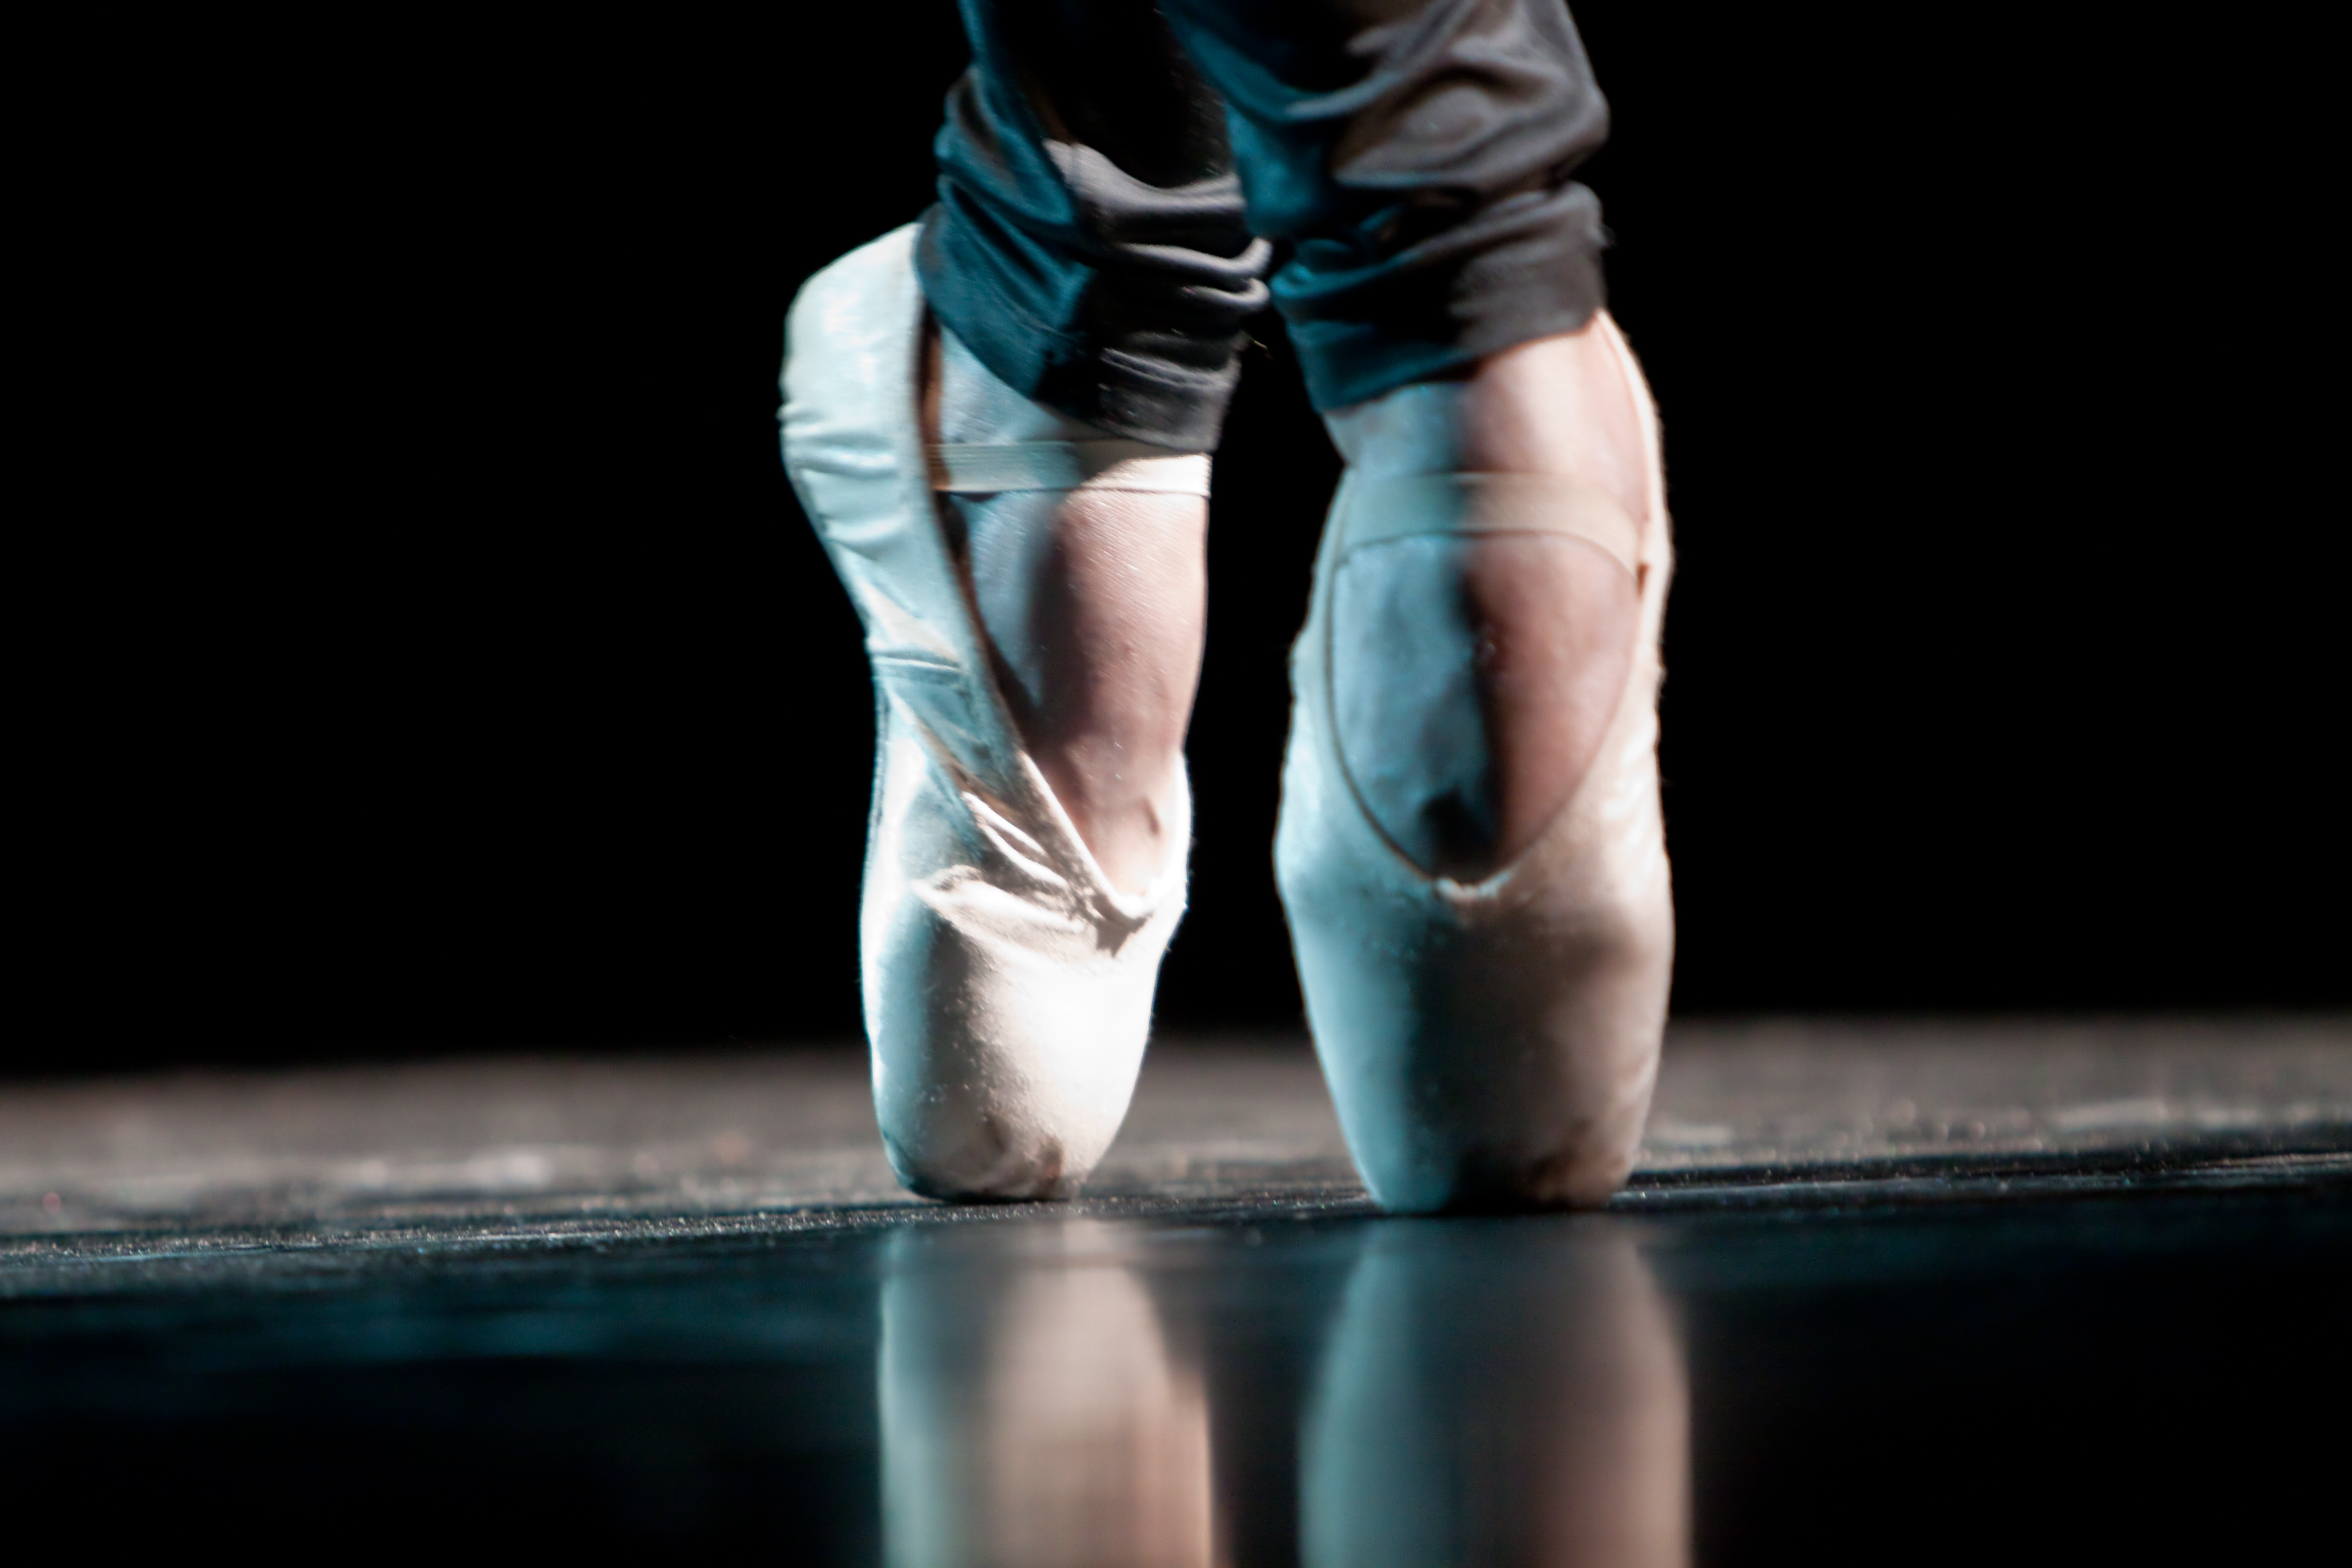 Eindvoorstelling Balletschool Marut Jorquera 'The Gallery'